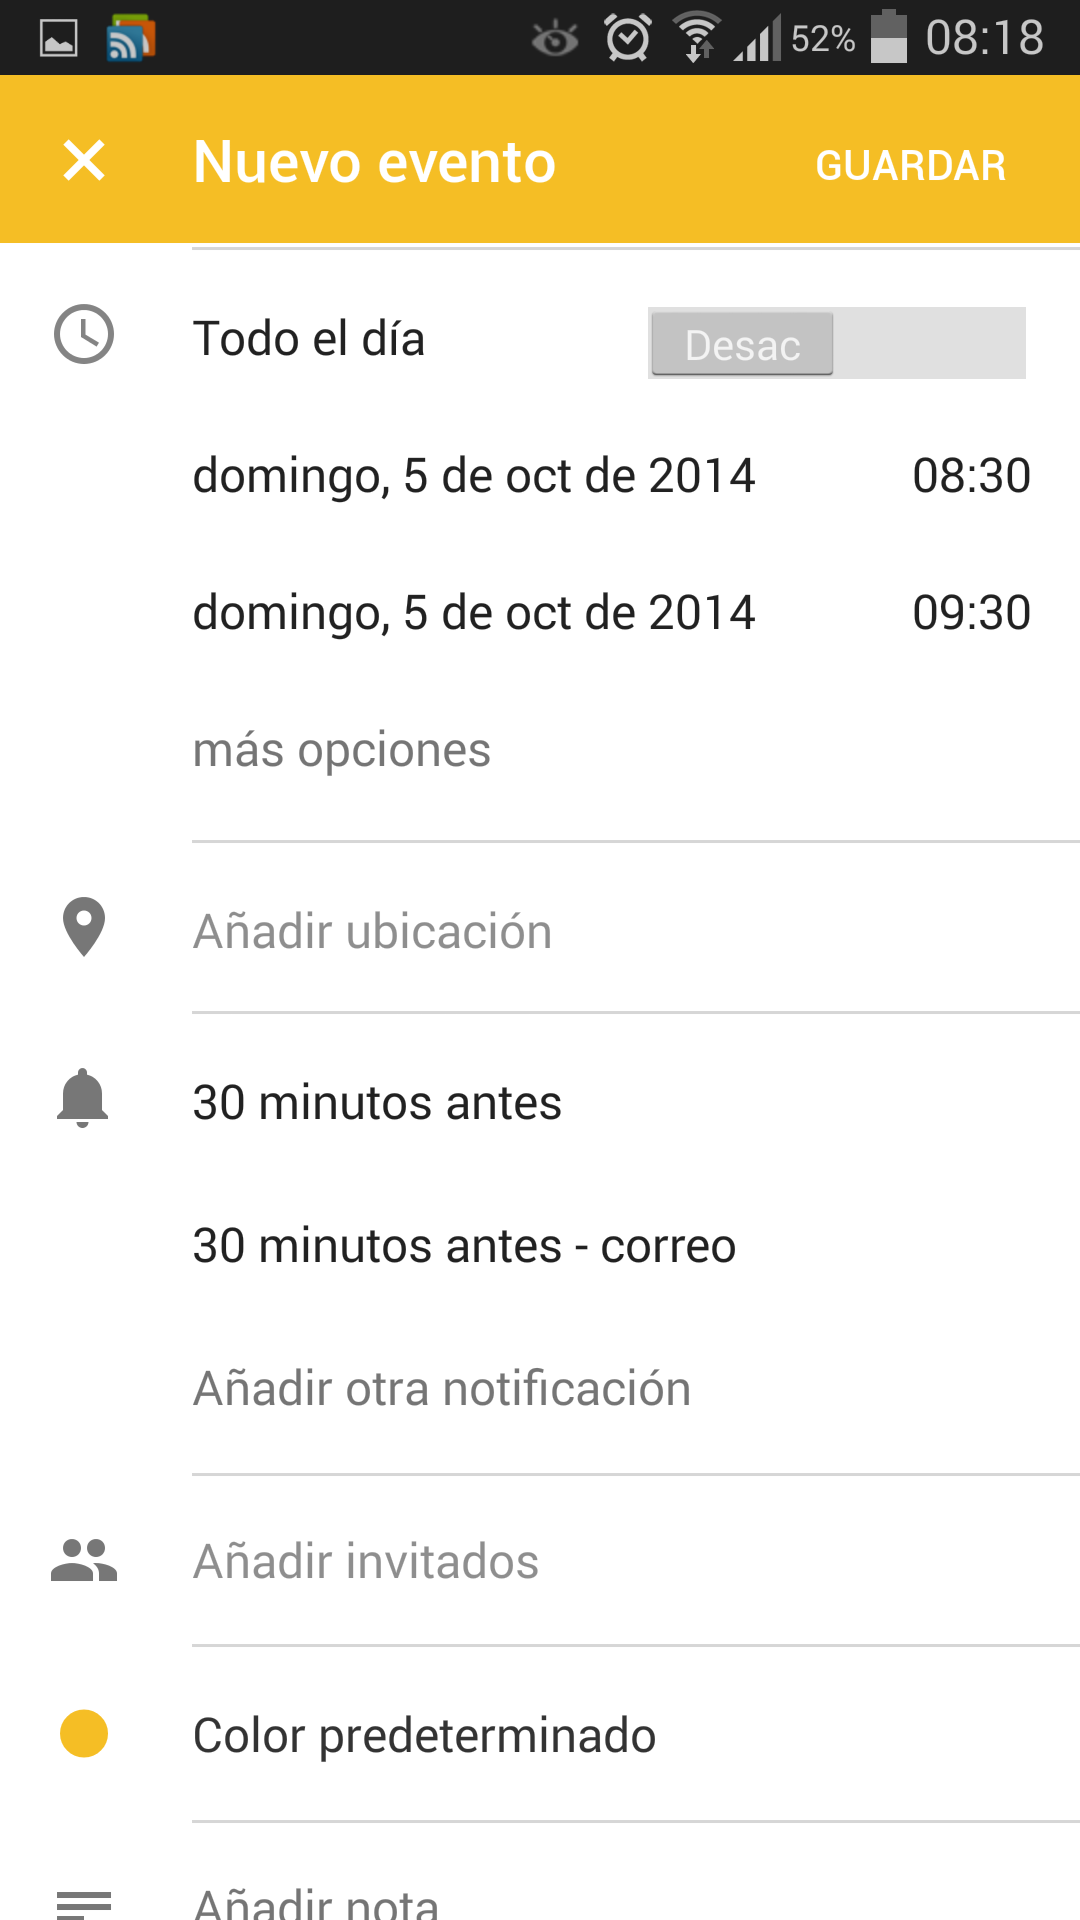 Añadir cita en Google Calendar 5.0